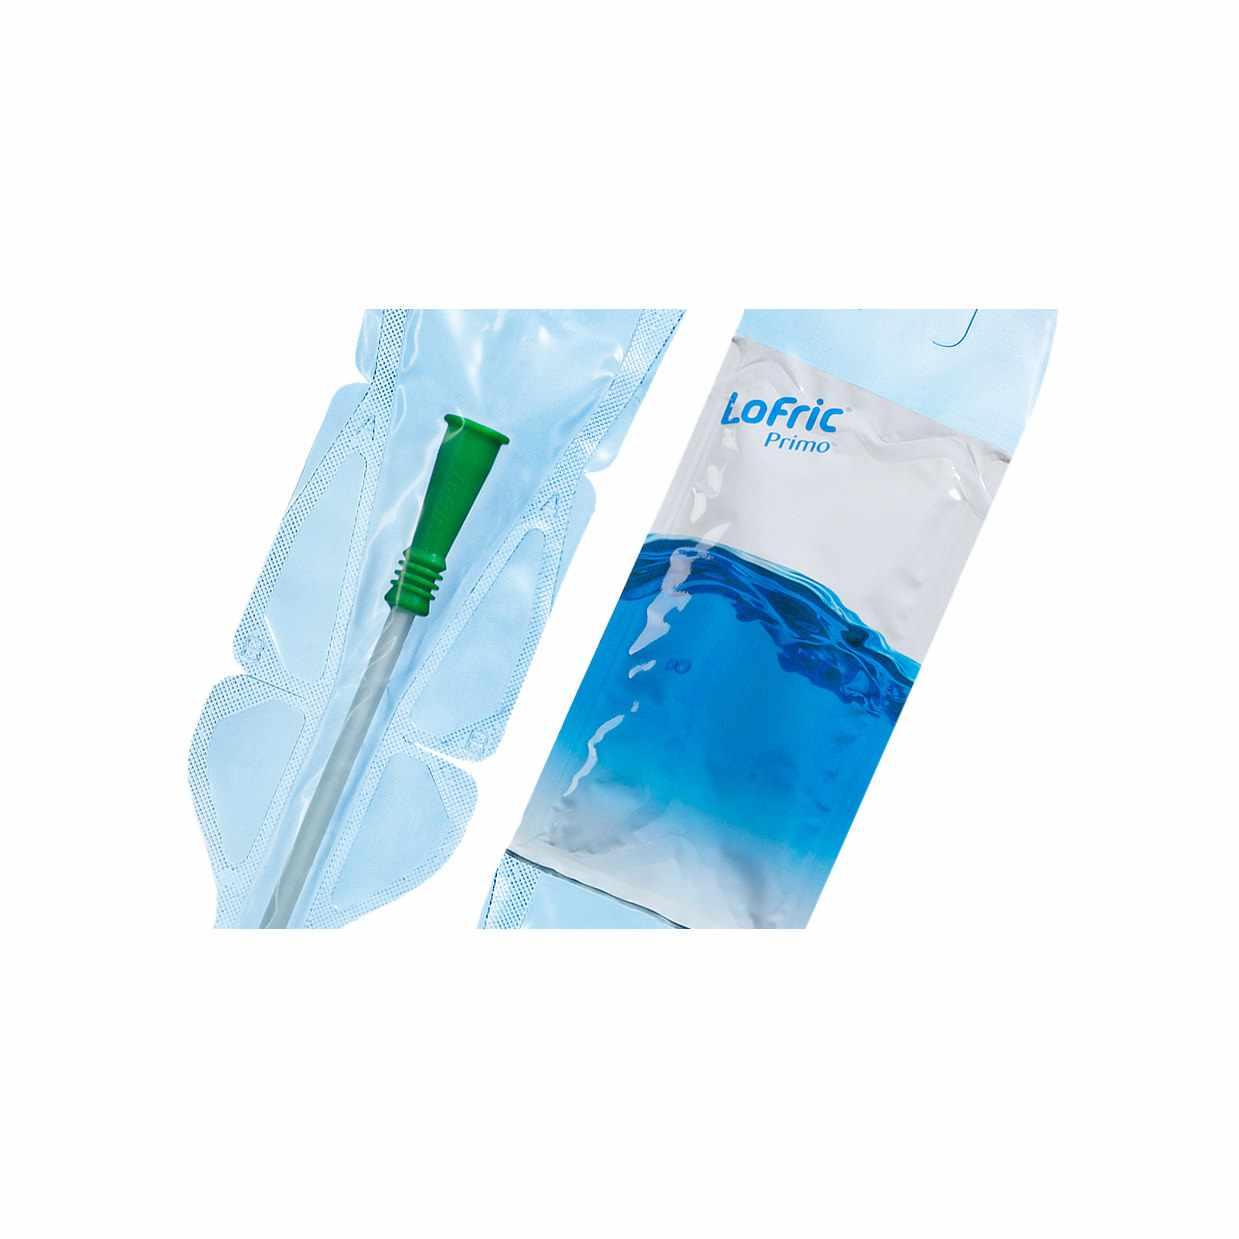 Wellspect LoFric Primo Male Hydrophilic Intermittent Catheter, 12 Fr